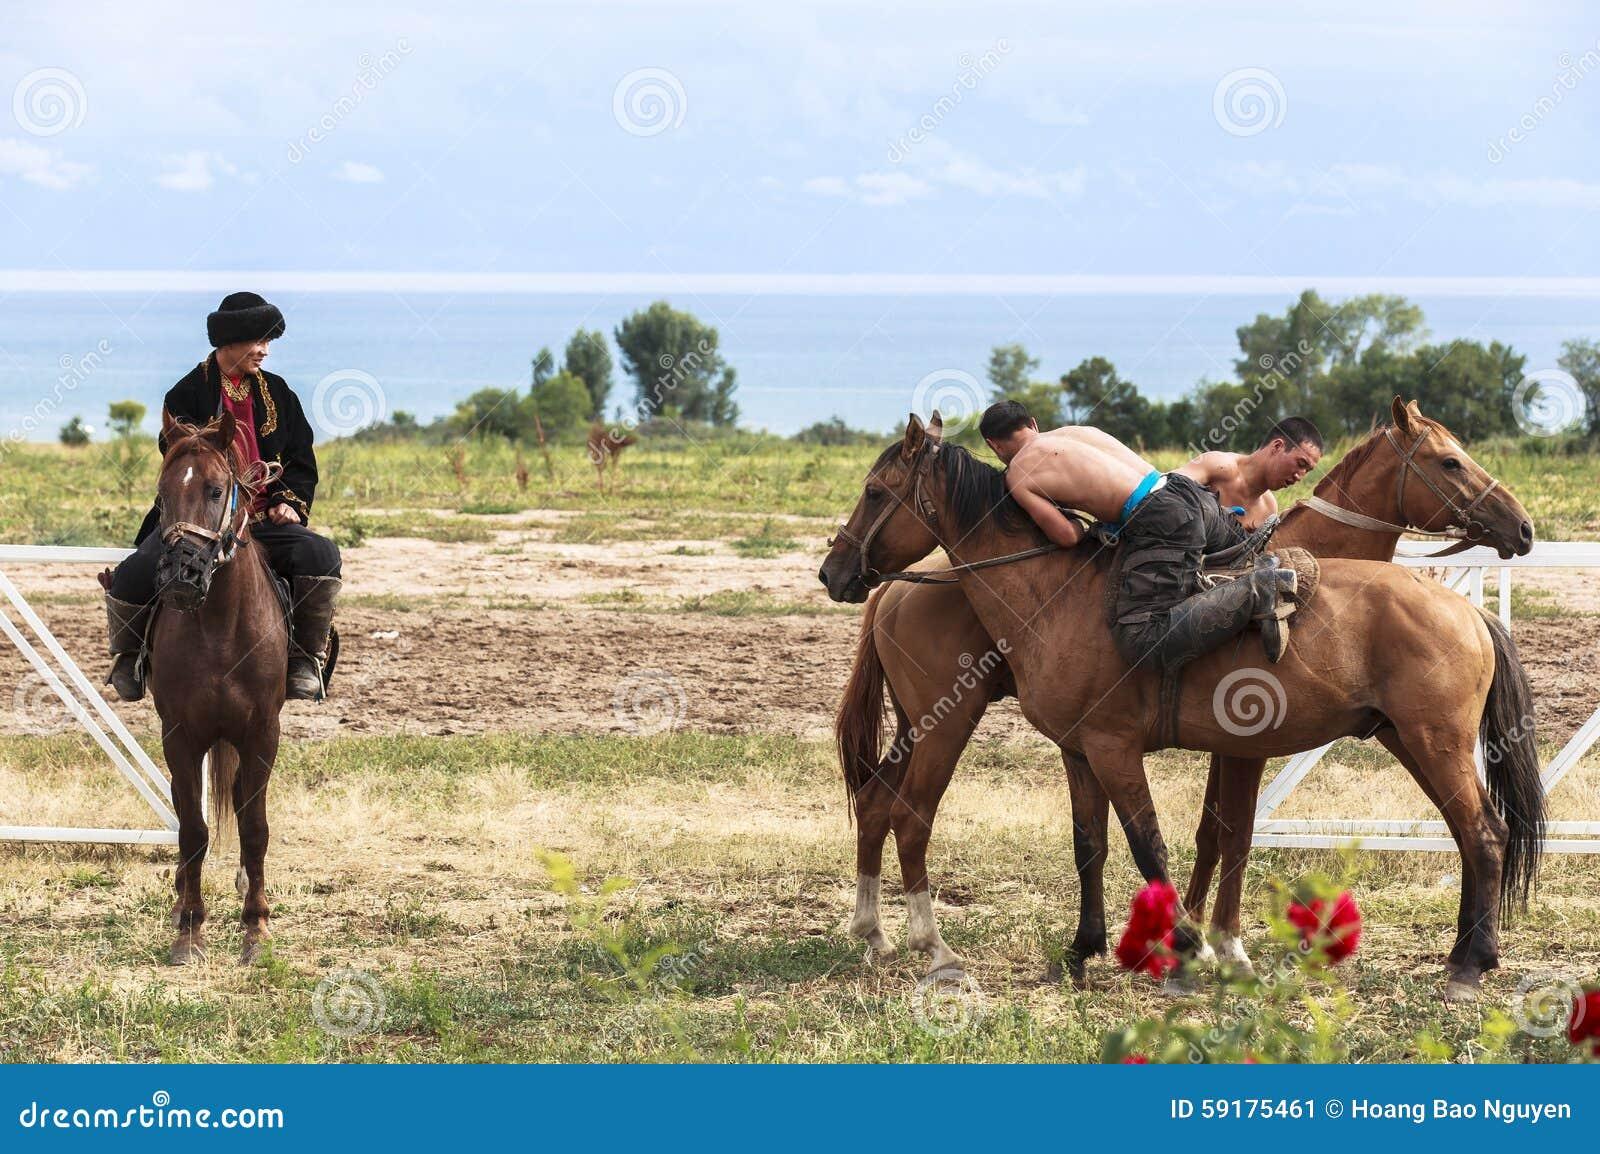 Horse game at Song Kul Lake in Kyrgyzstan